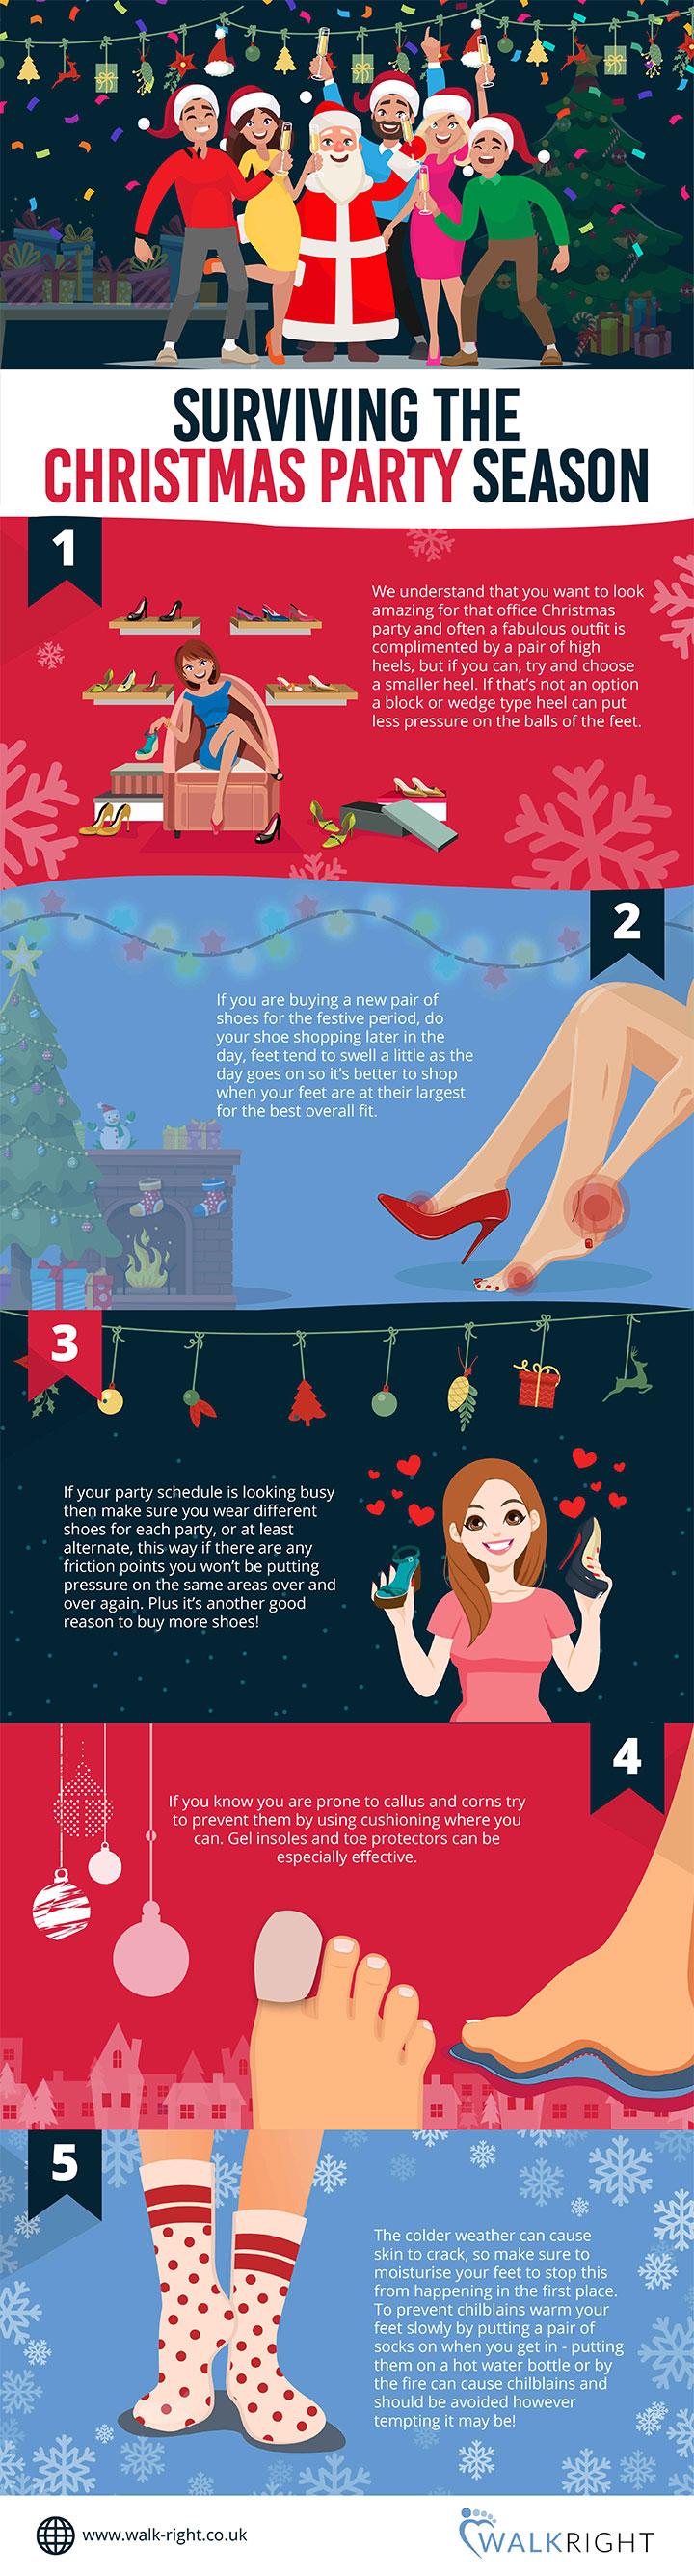 surviving-the-christmas-party-season.jpg